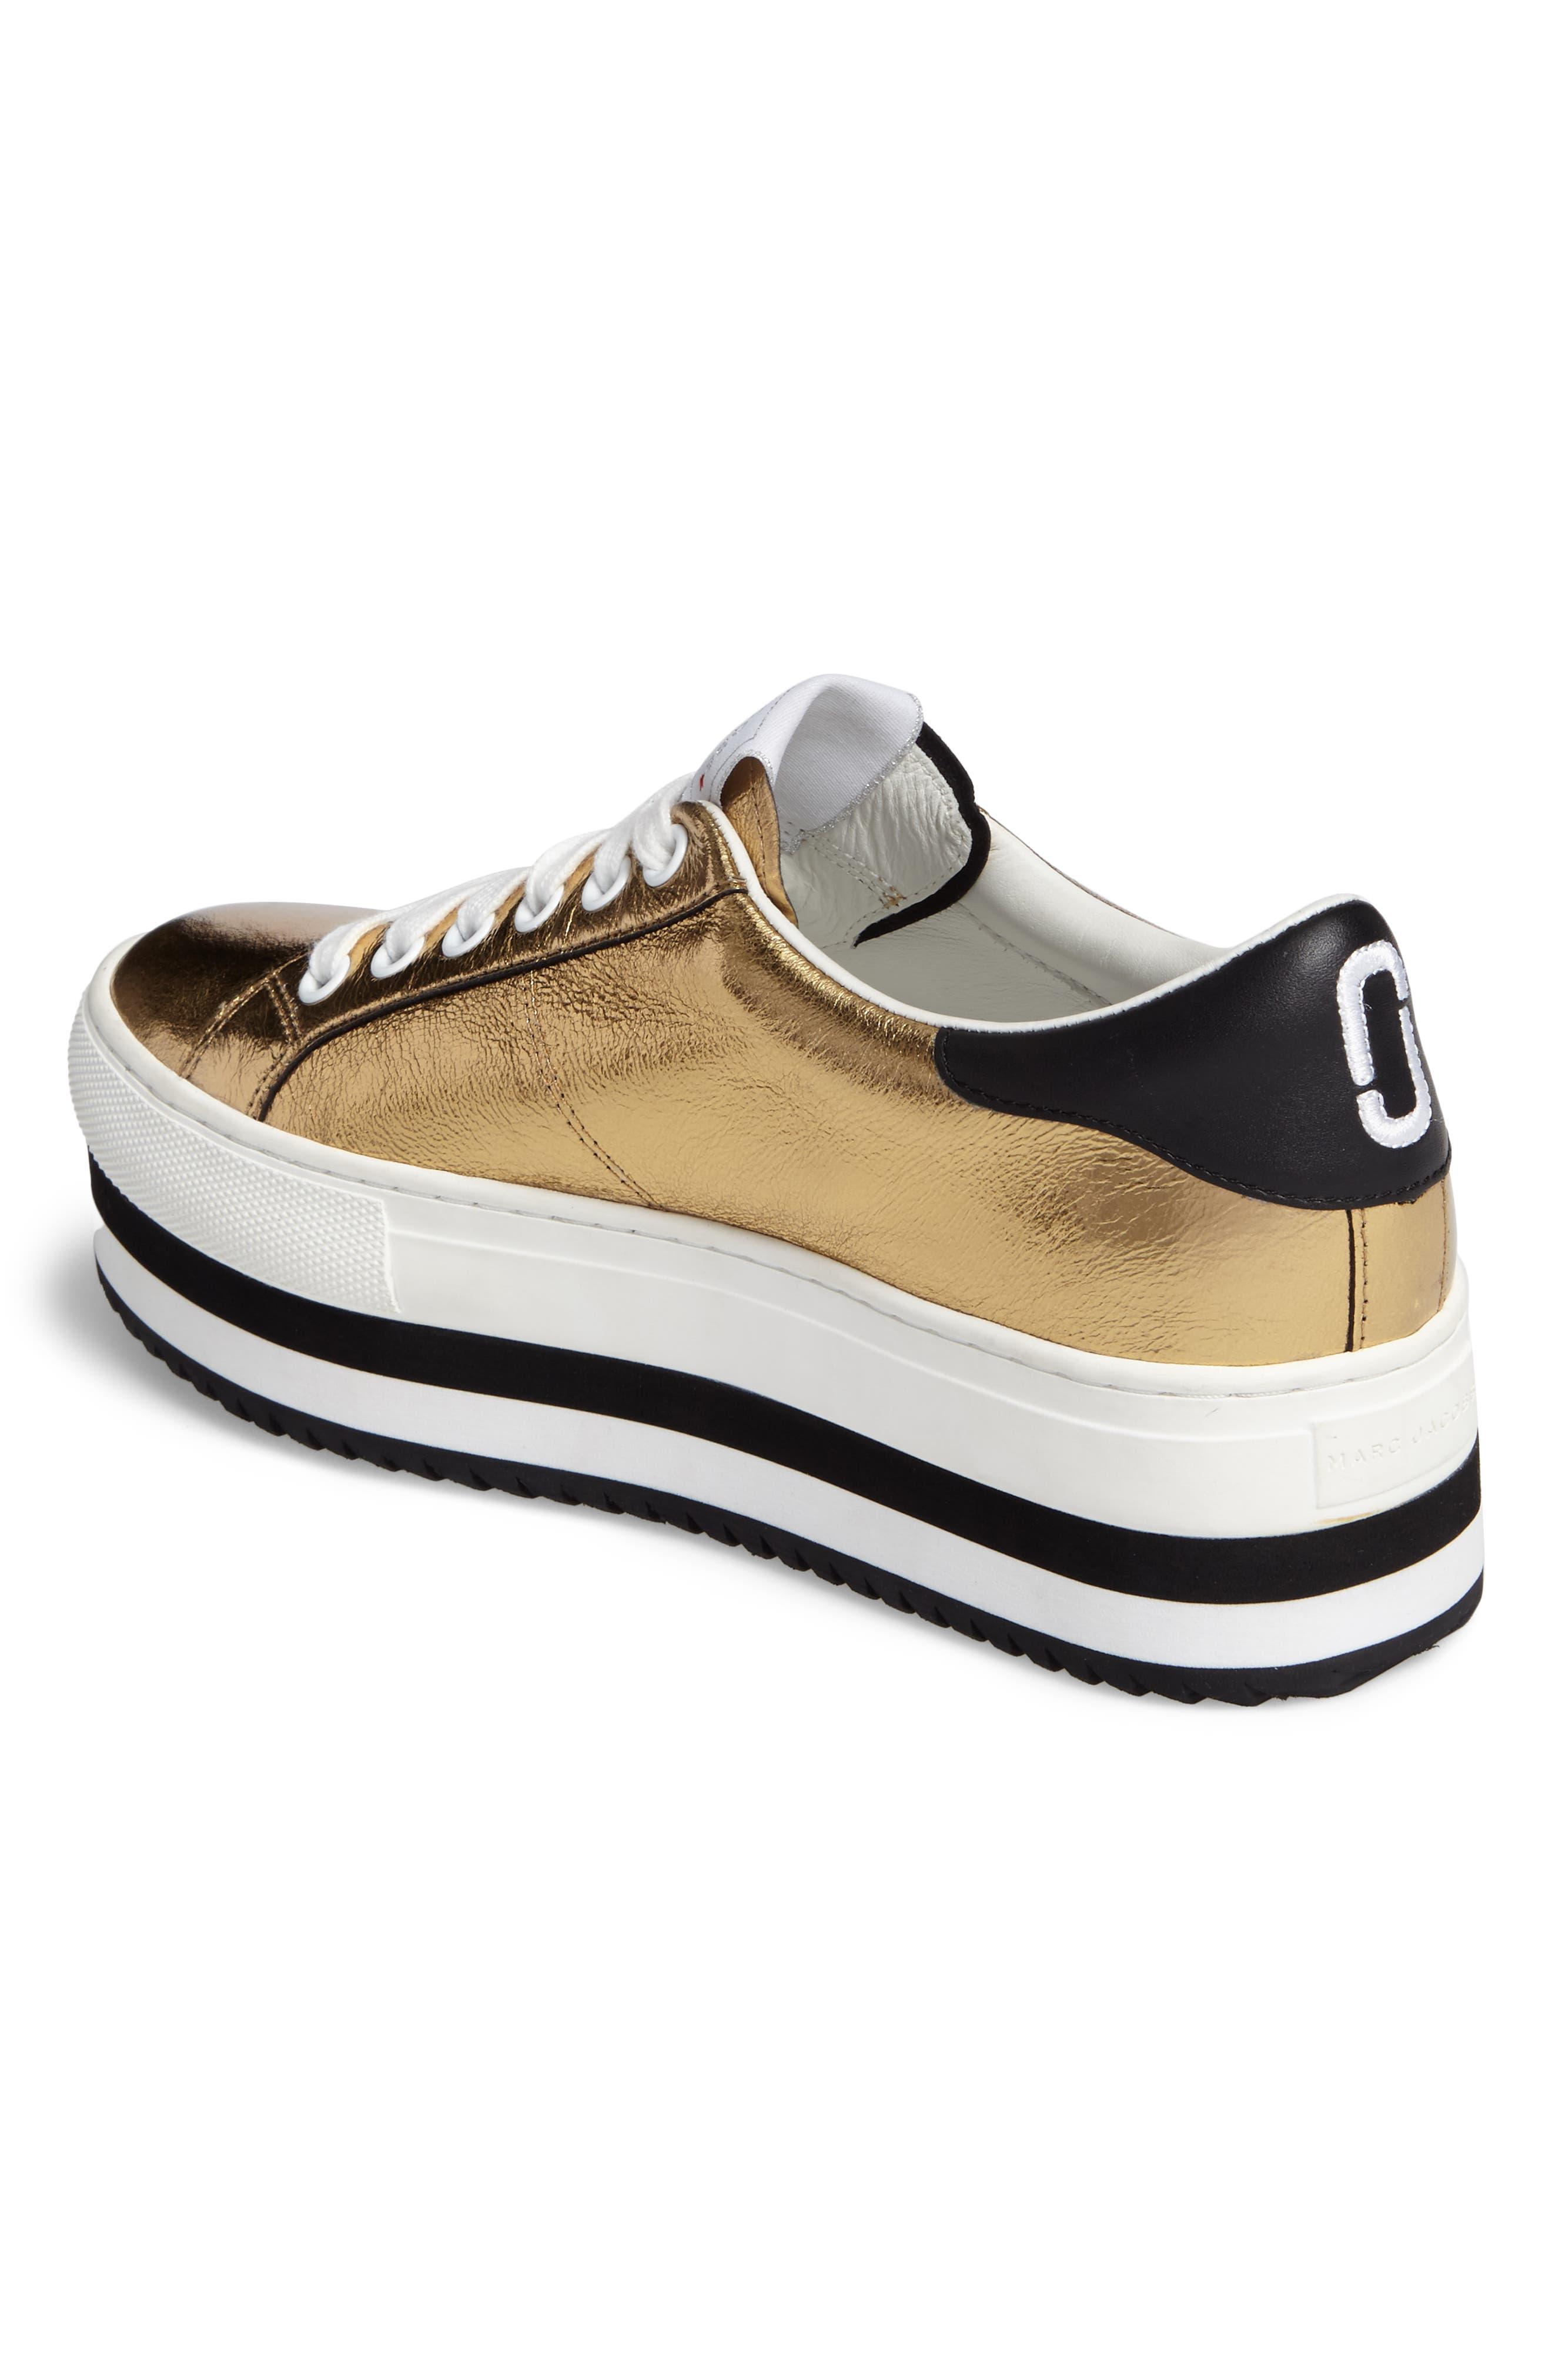 Grand Platform Sneaker,                             Alternate thumbnail 3, color,                             Gold